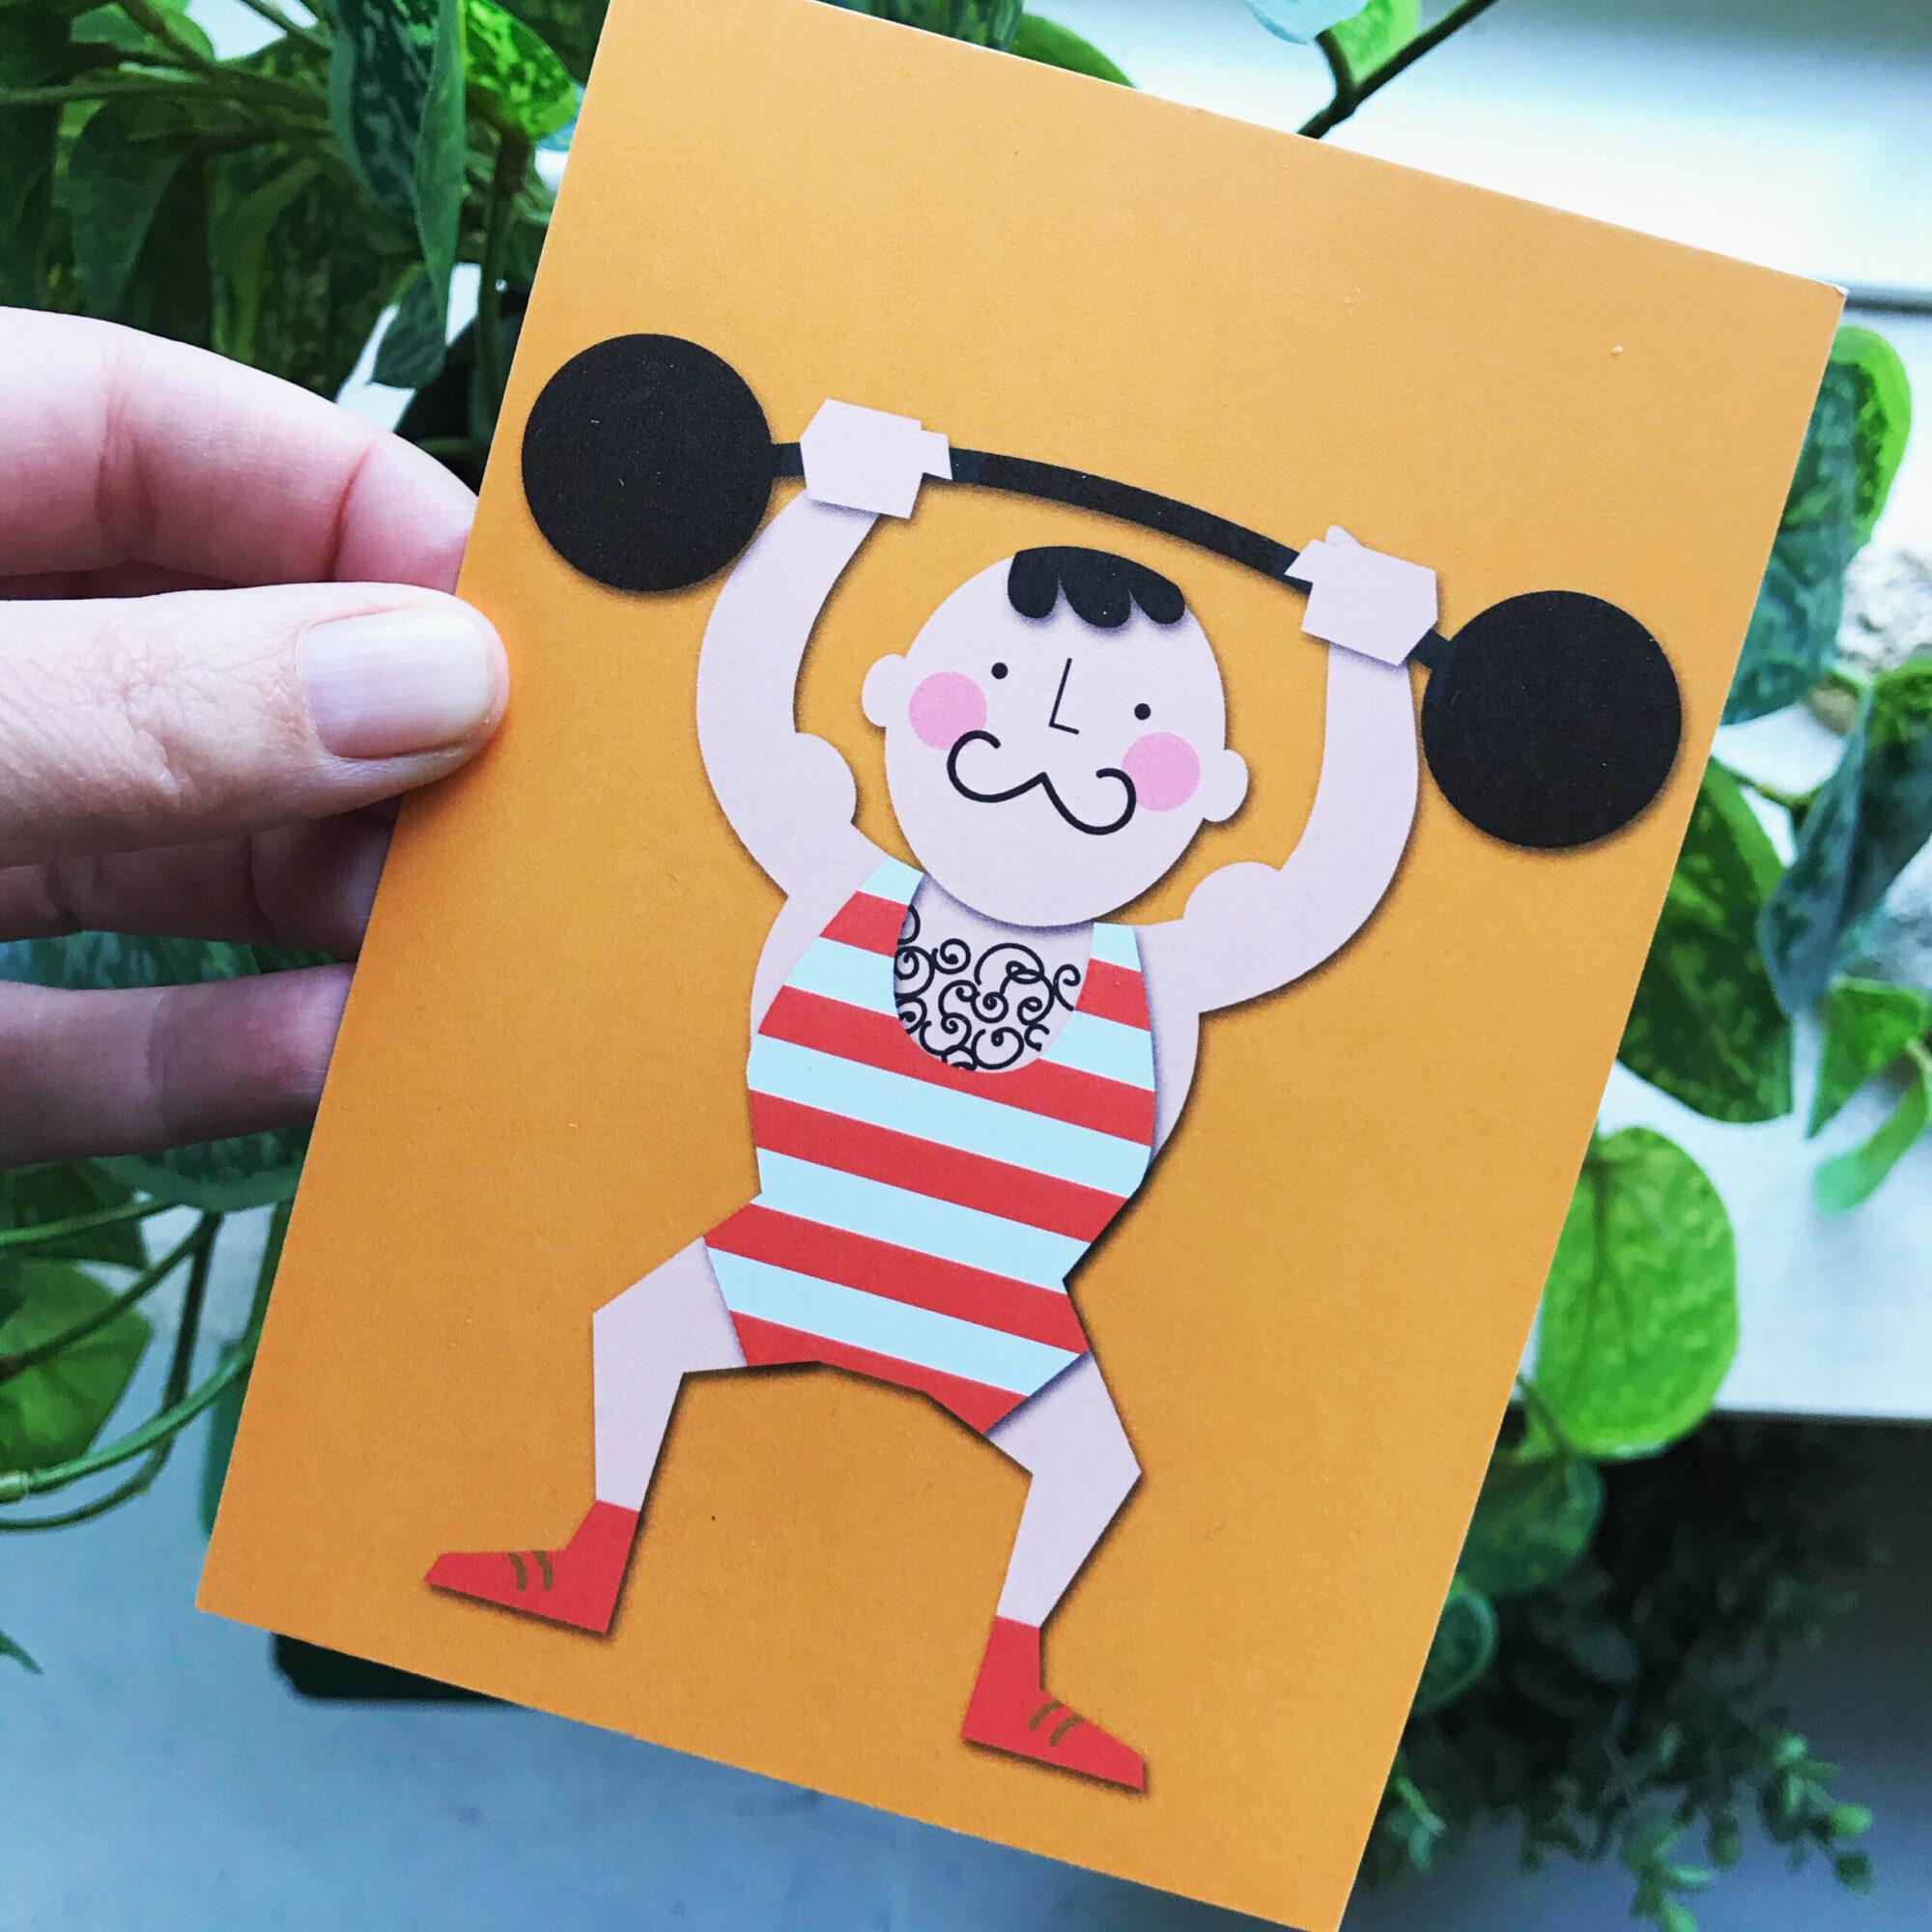 Sterke man - Jetske Kox Illustraties - Vrolijke posters, prints en ansichtkaarten